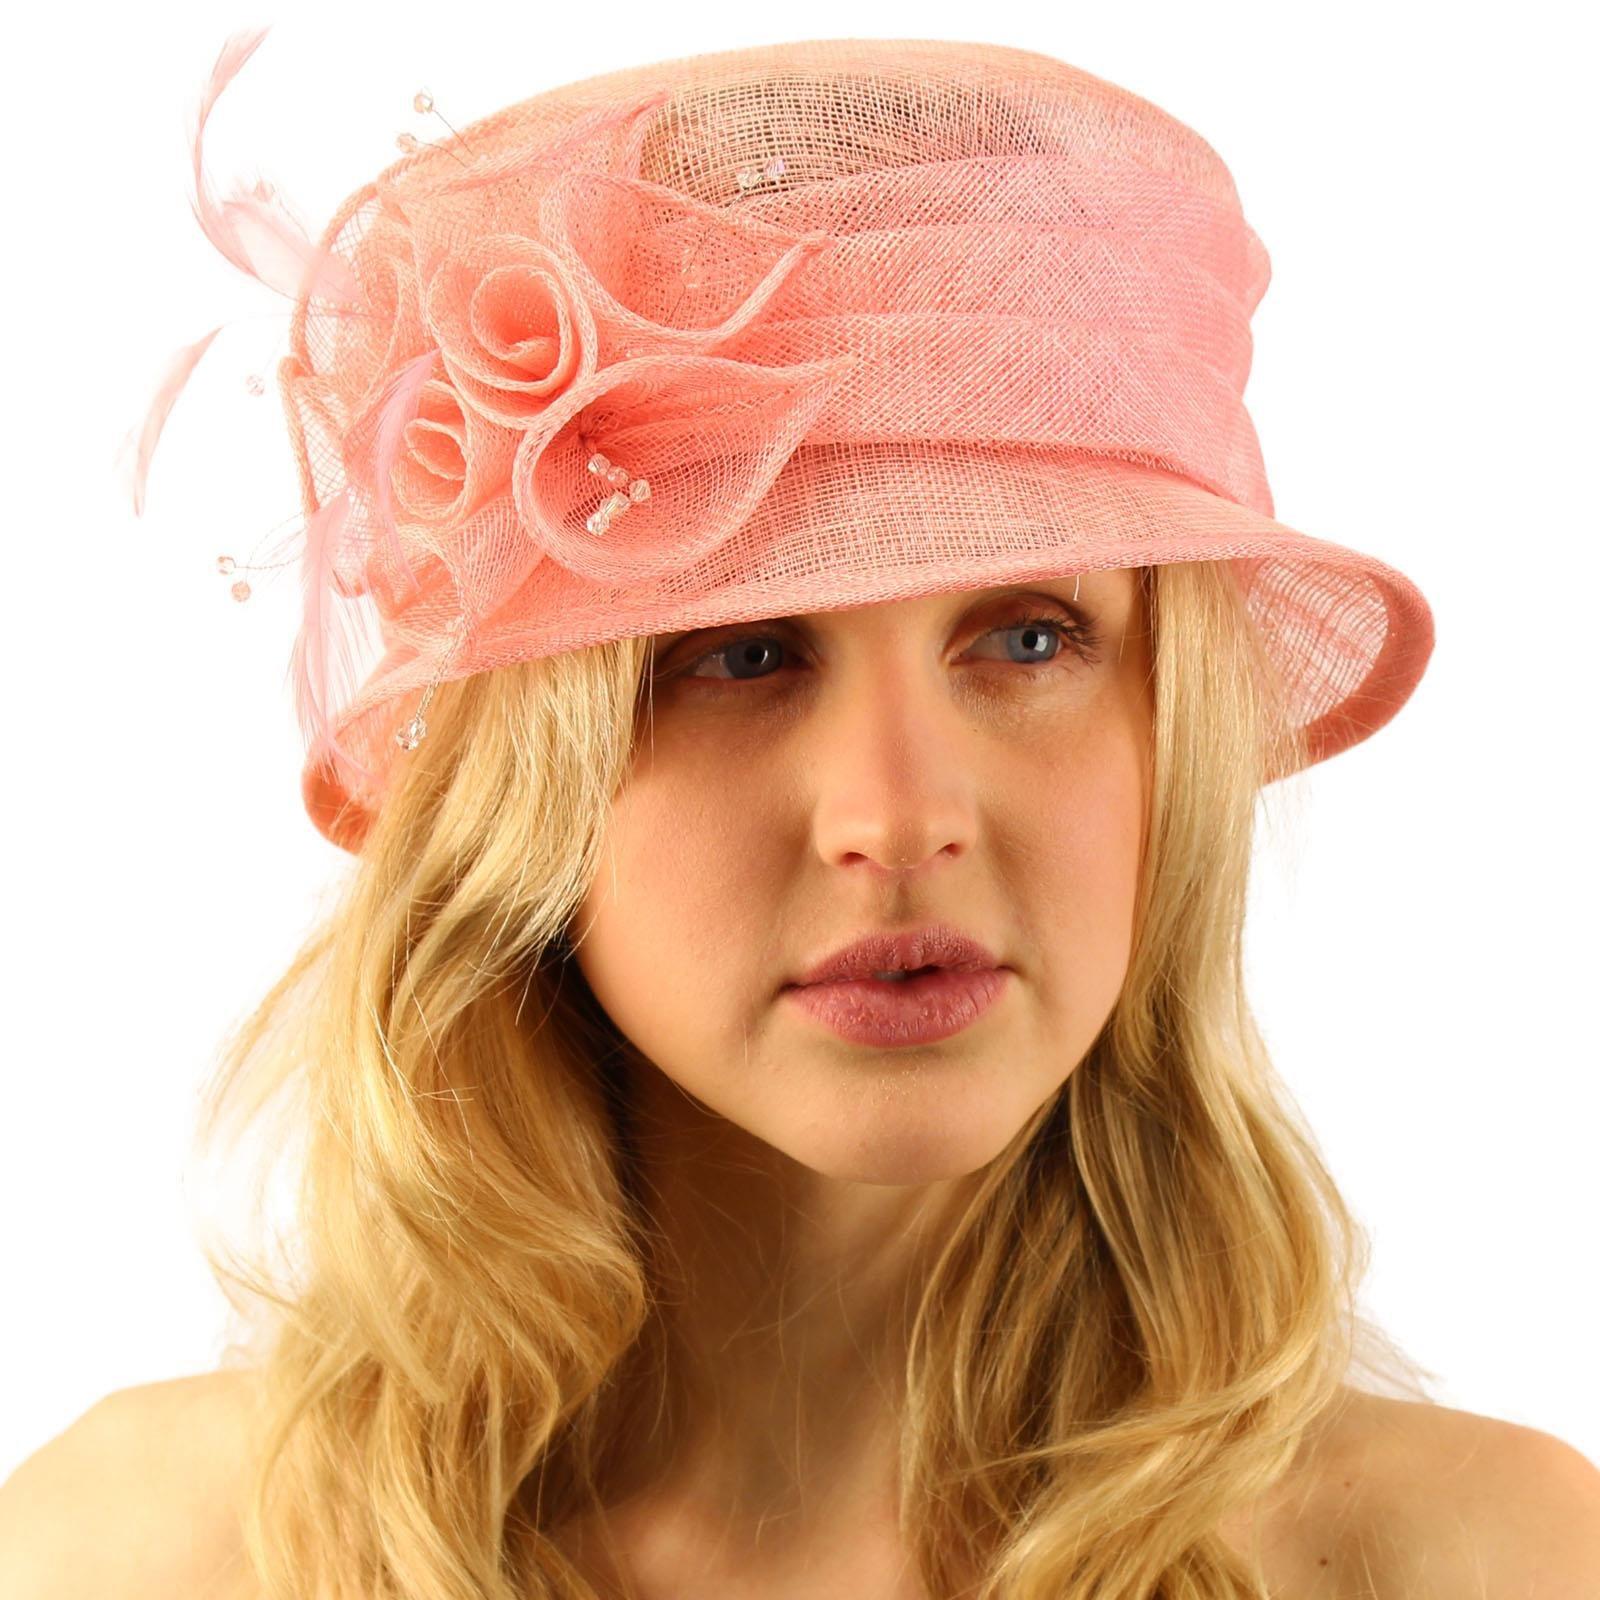 Summer Fancy 1920s Flapper Sinamay Trio Floral Cloche Bucket Church Hat Pink